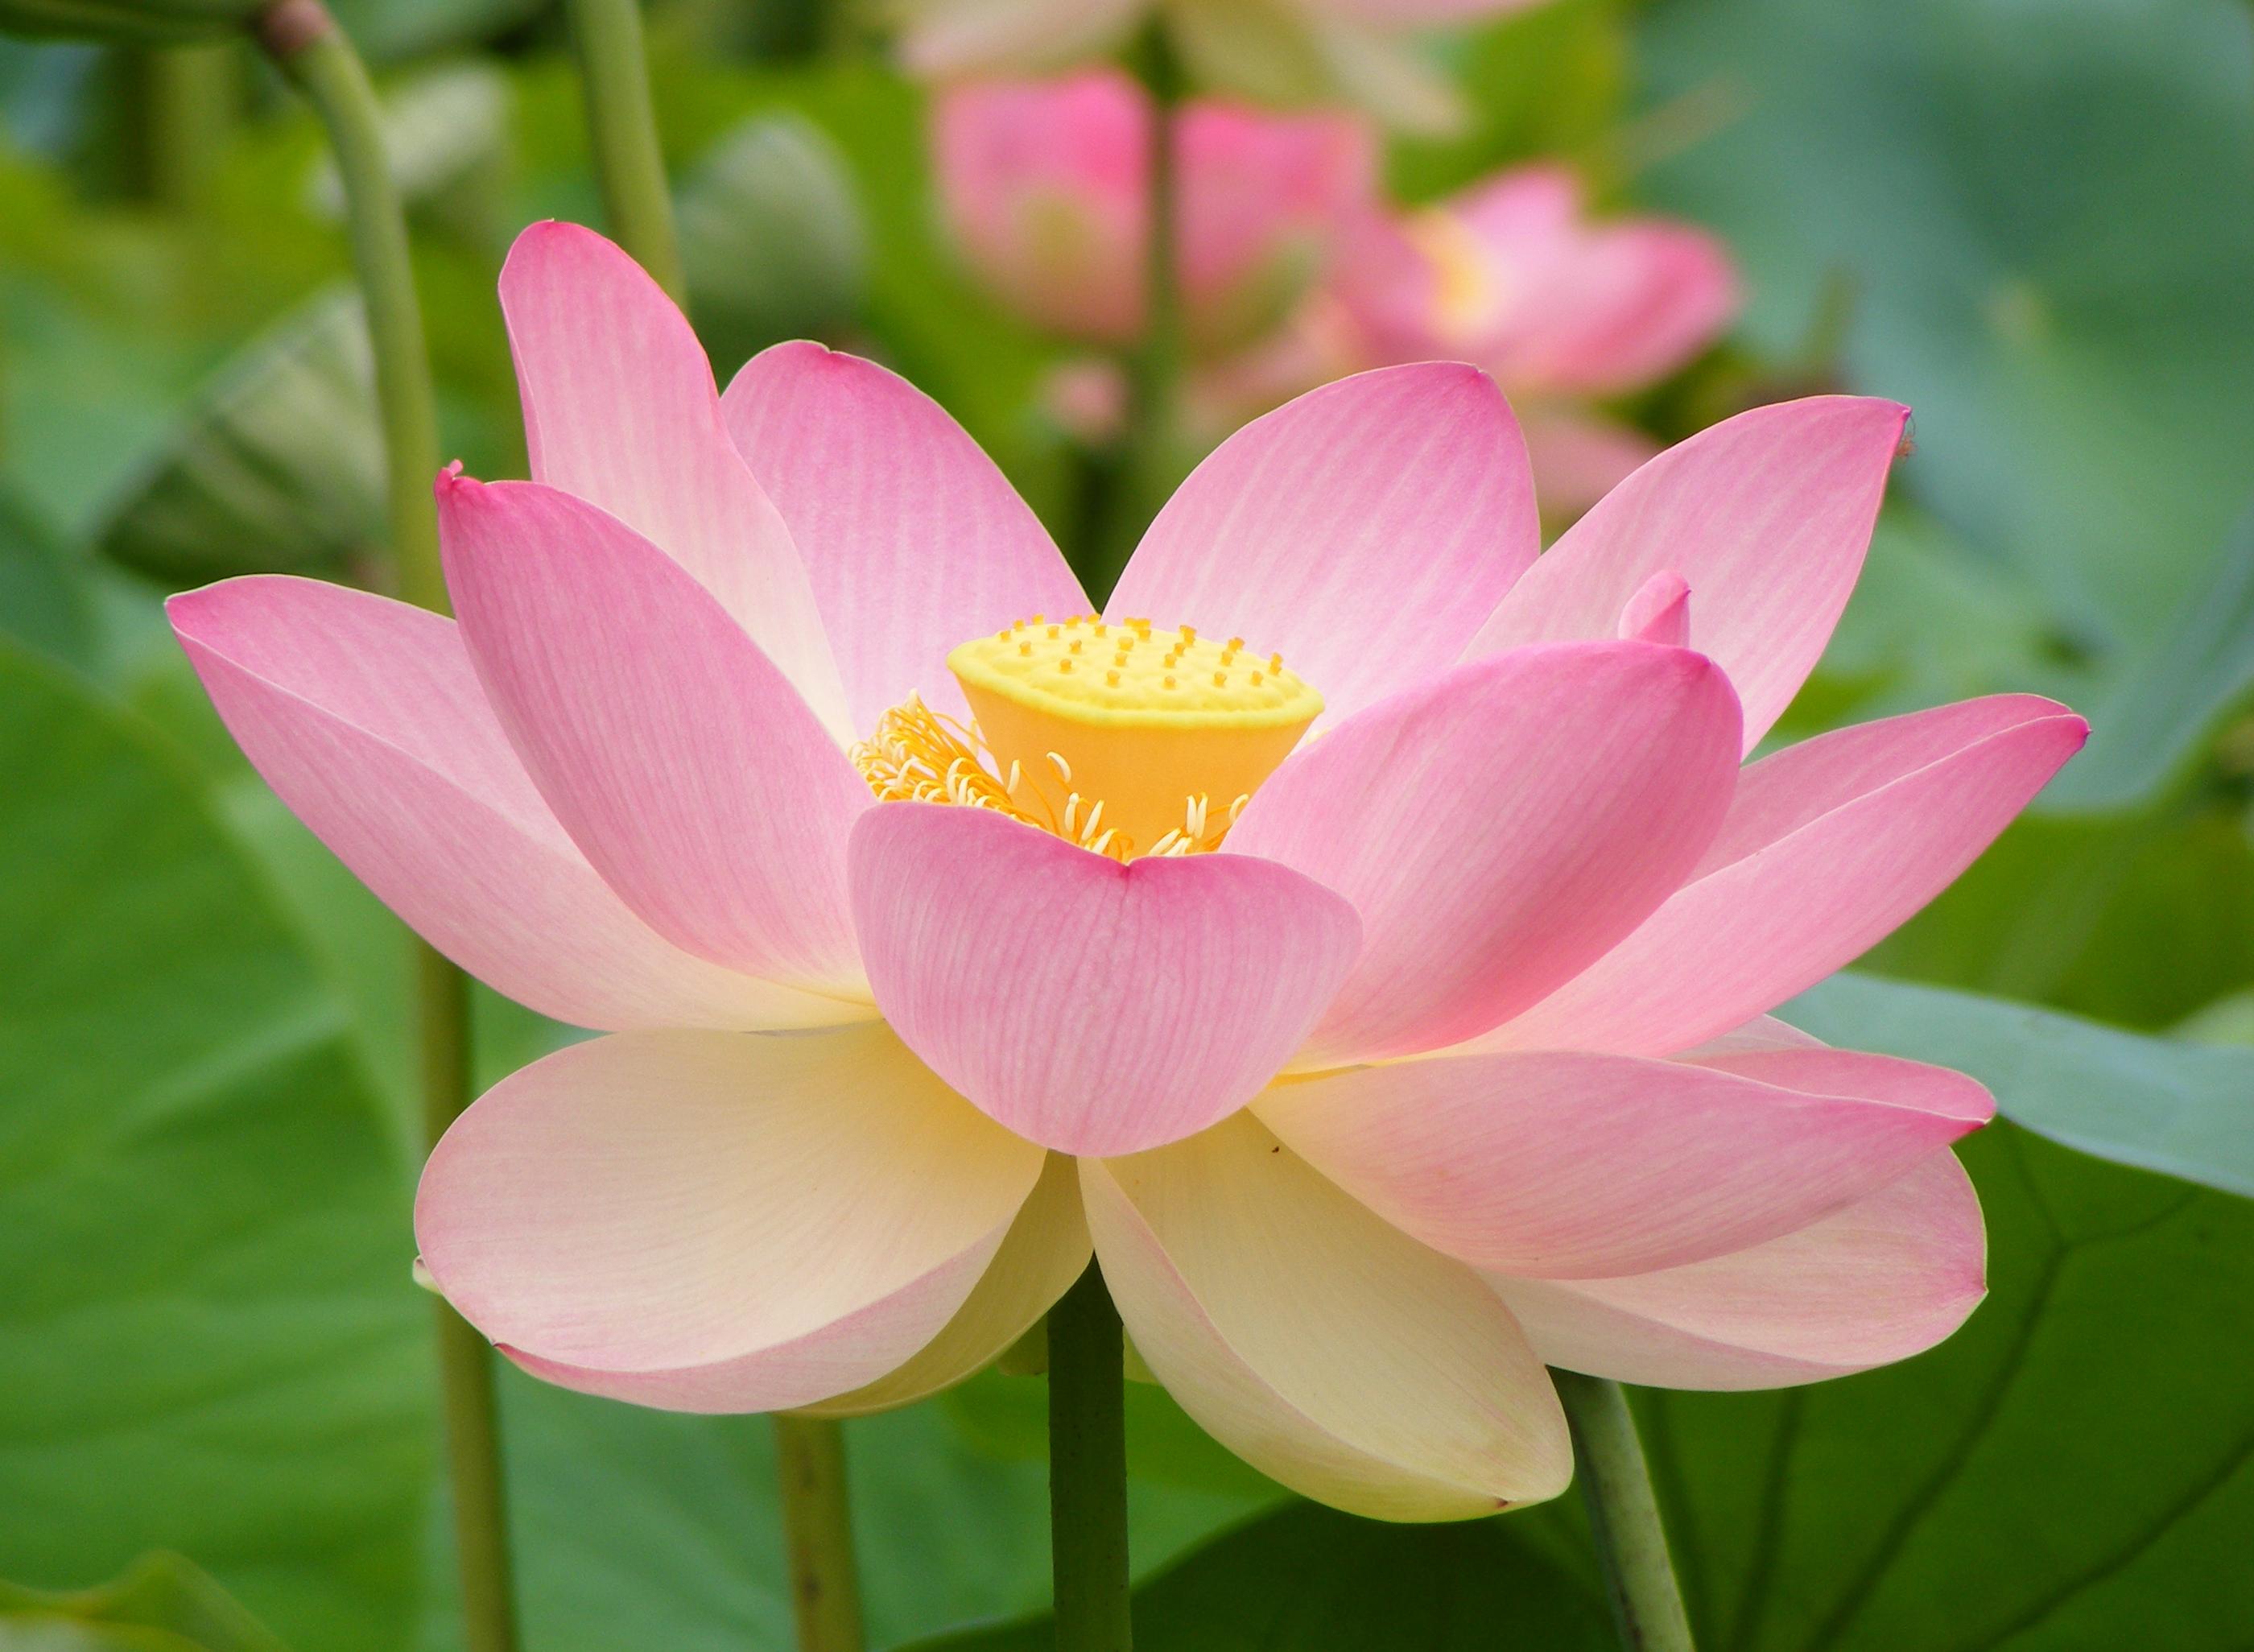 File:Nelumno nucifera open flower - botanic garden adelaide2.jpg ...